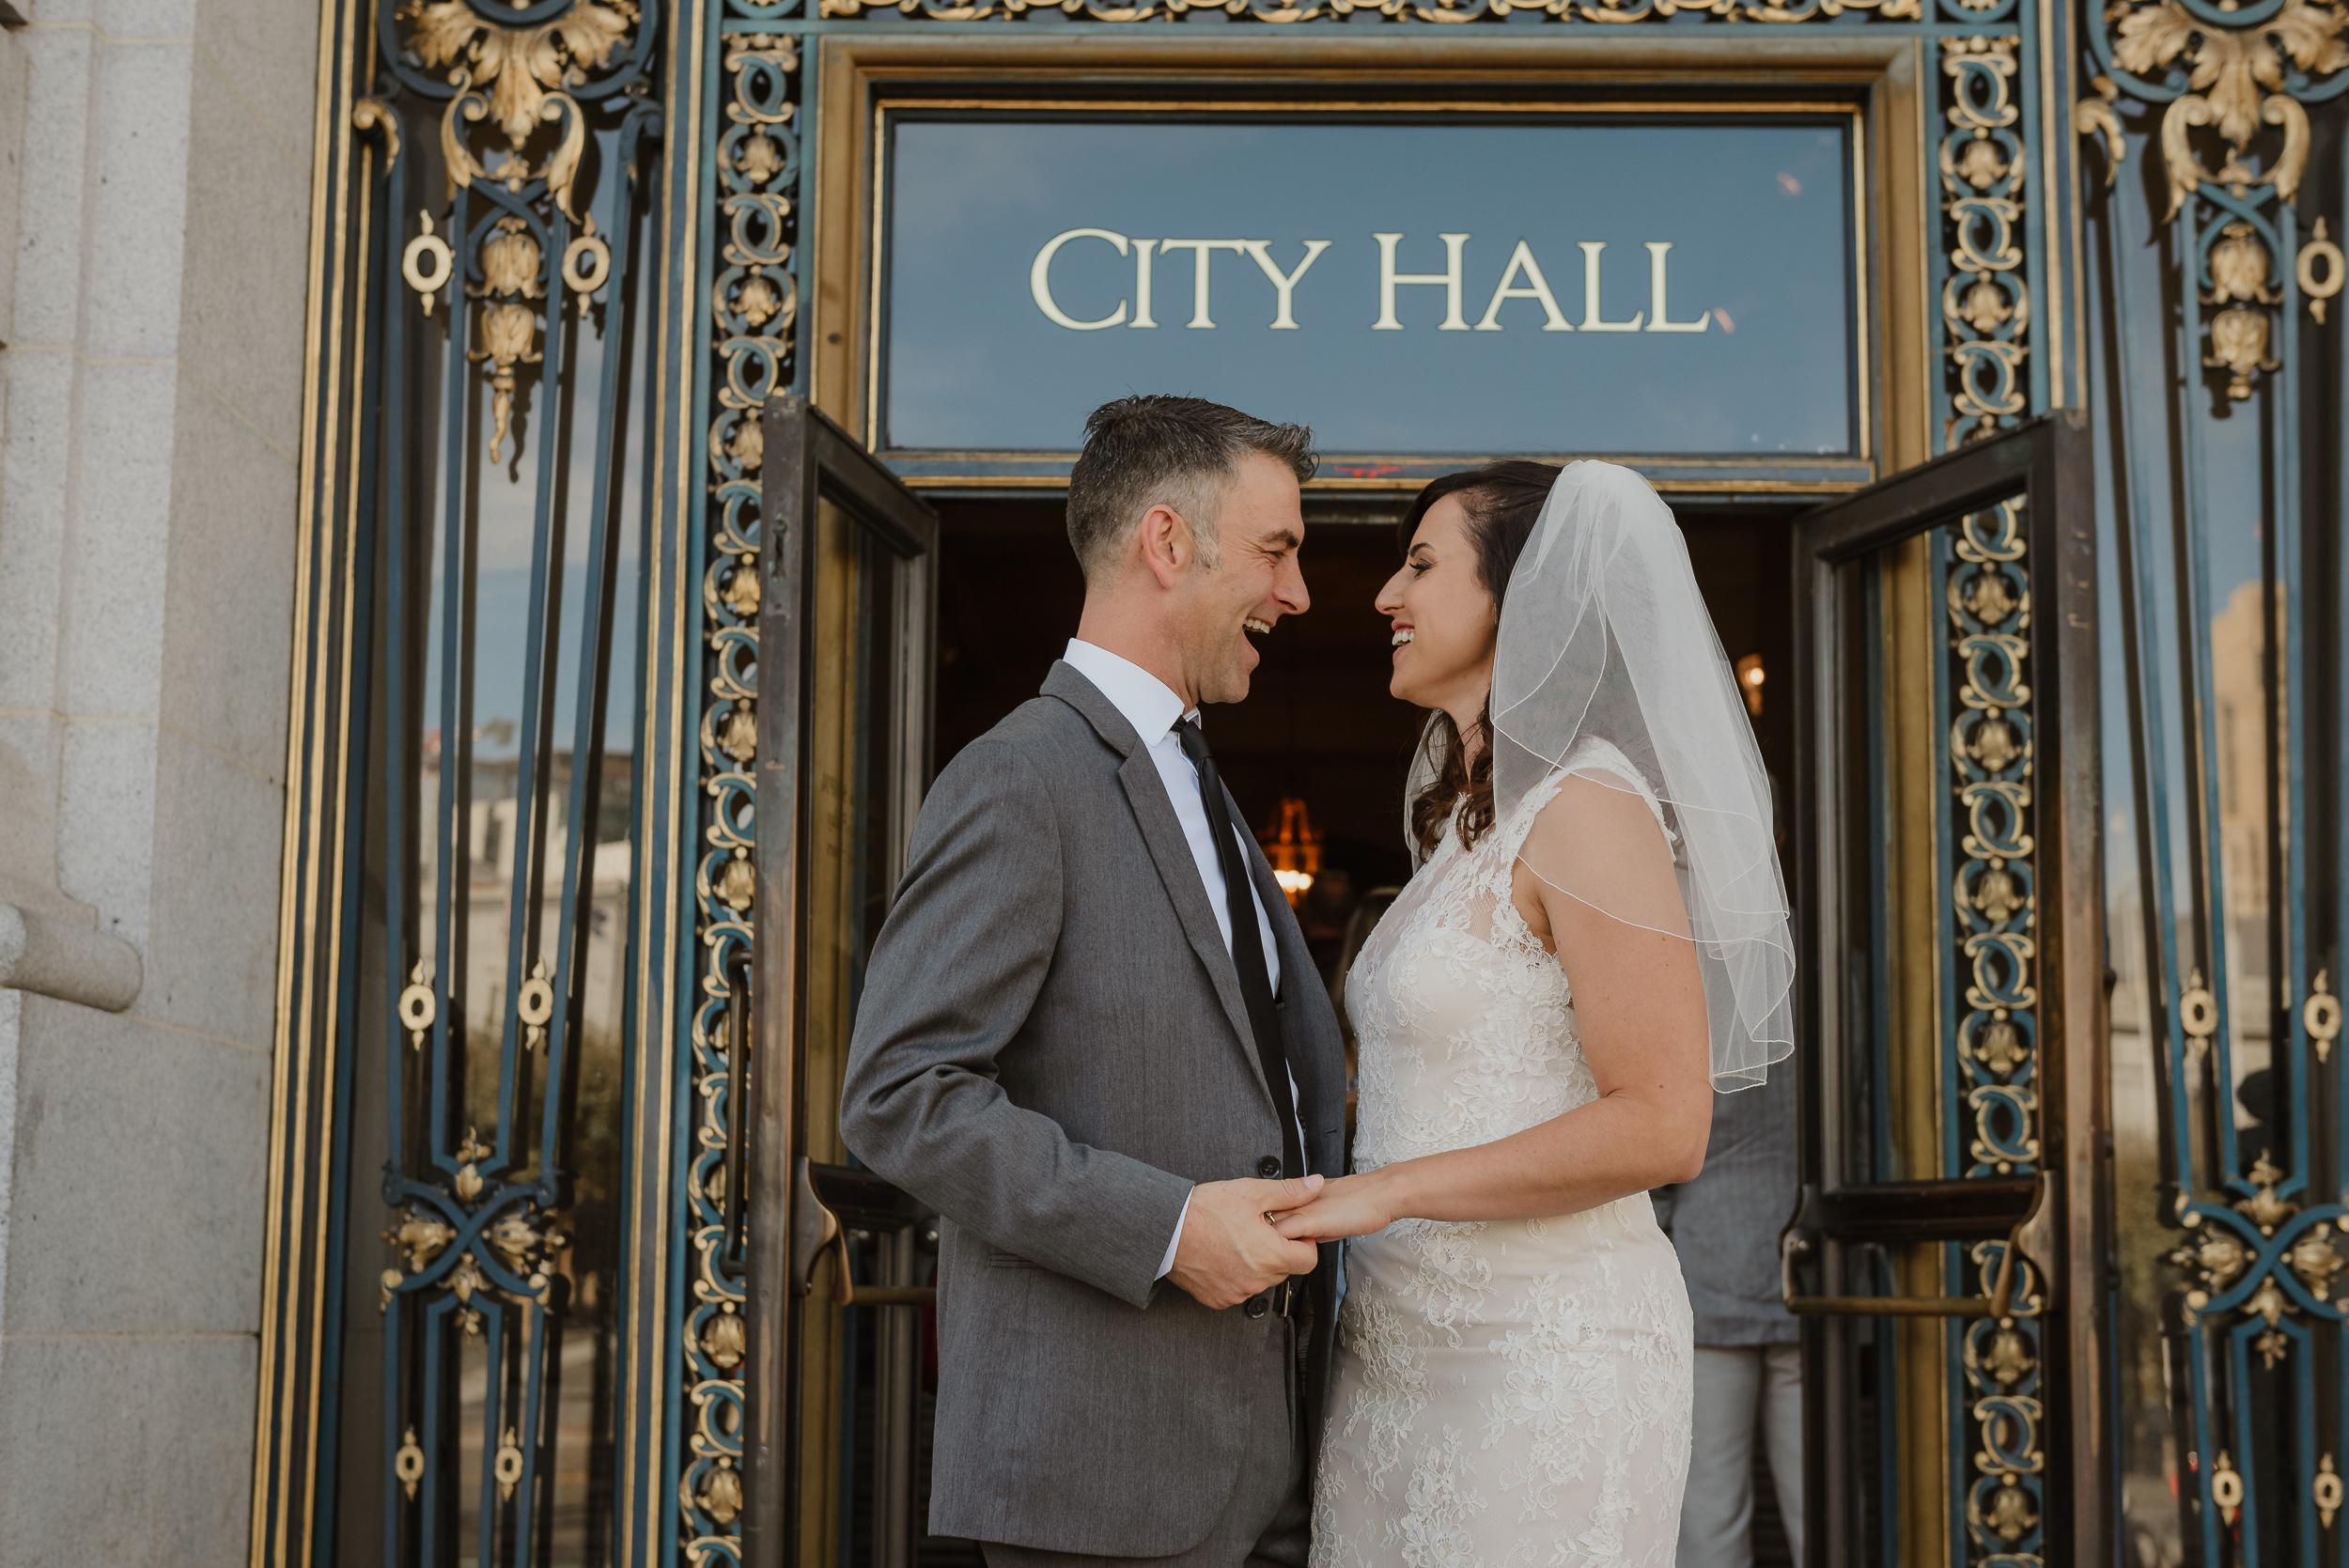 42-simple-san-francisco-city-hall-elopement-vivianchen-254.jpg